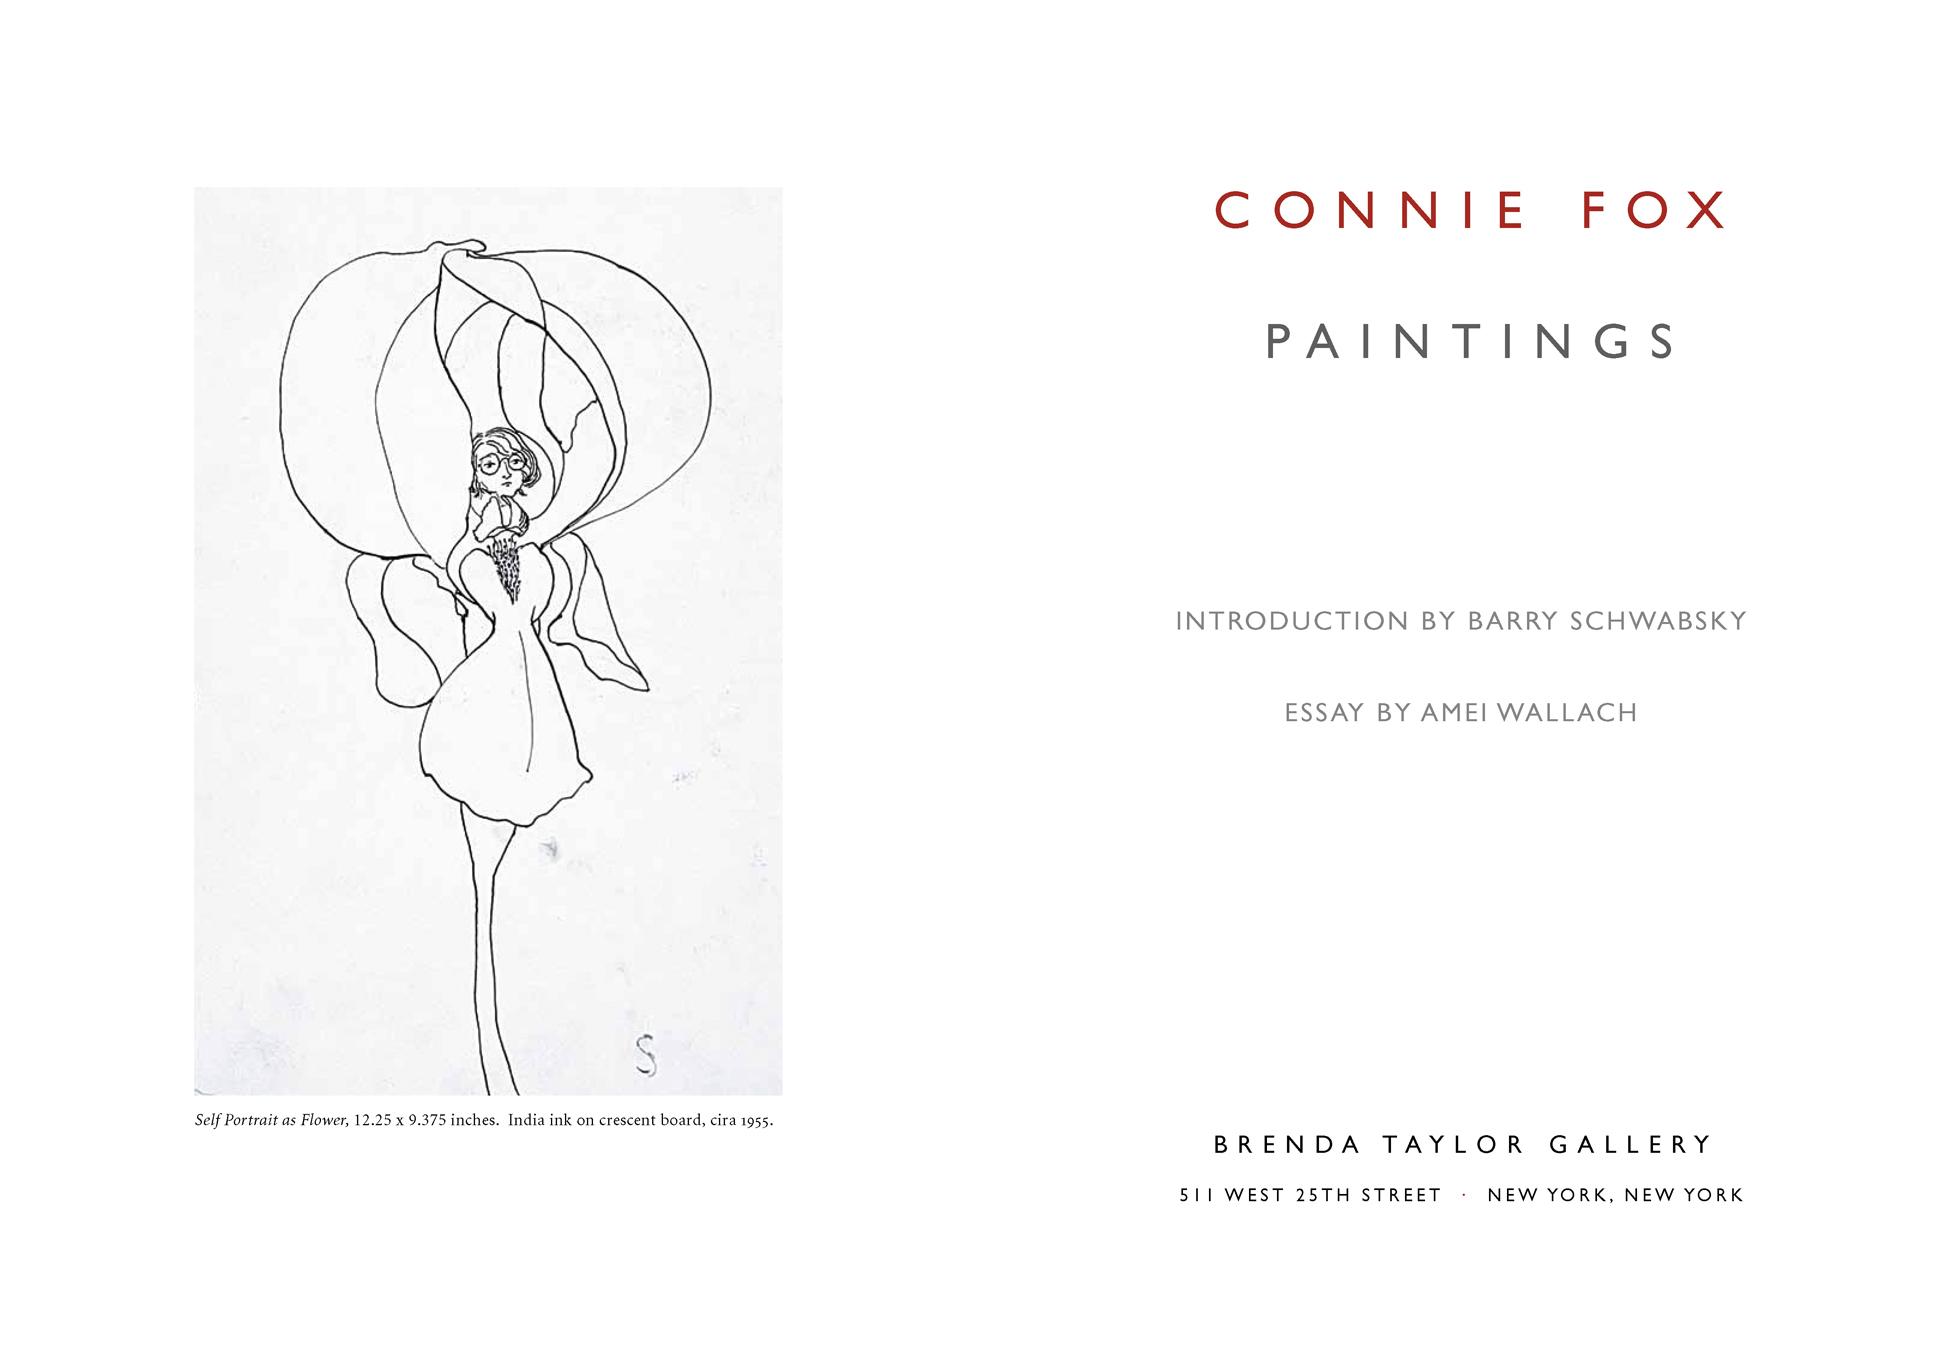 Connie Fox Paintings 2-3.jpg